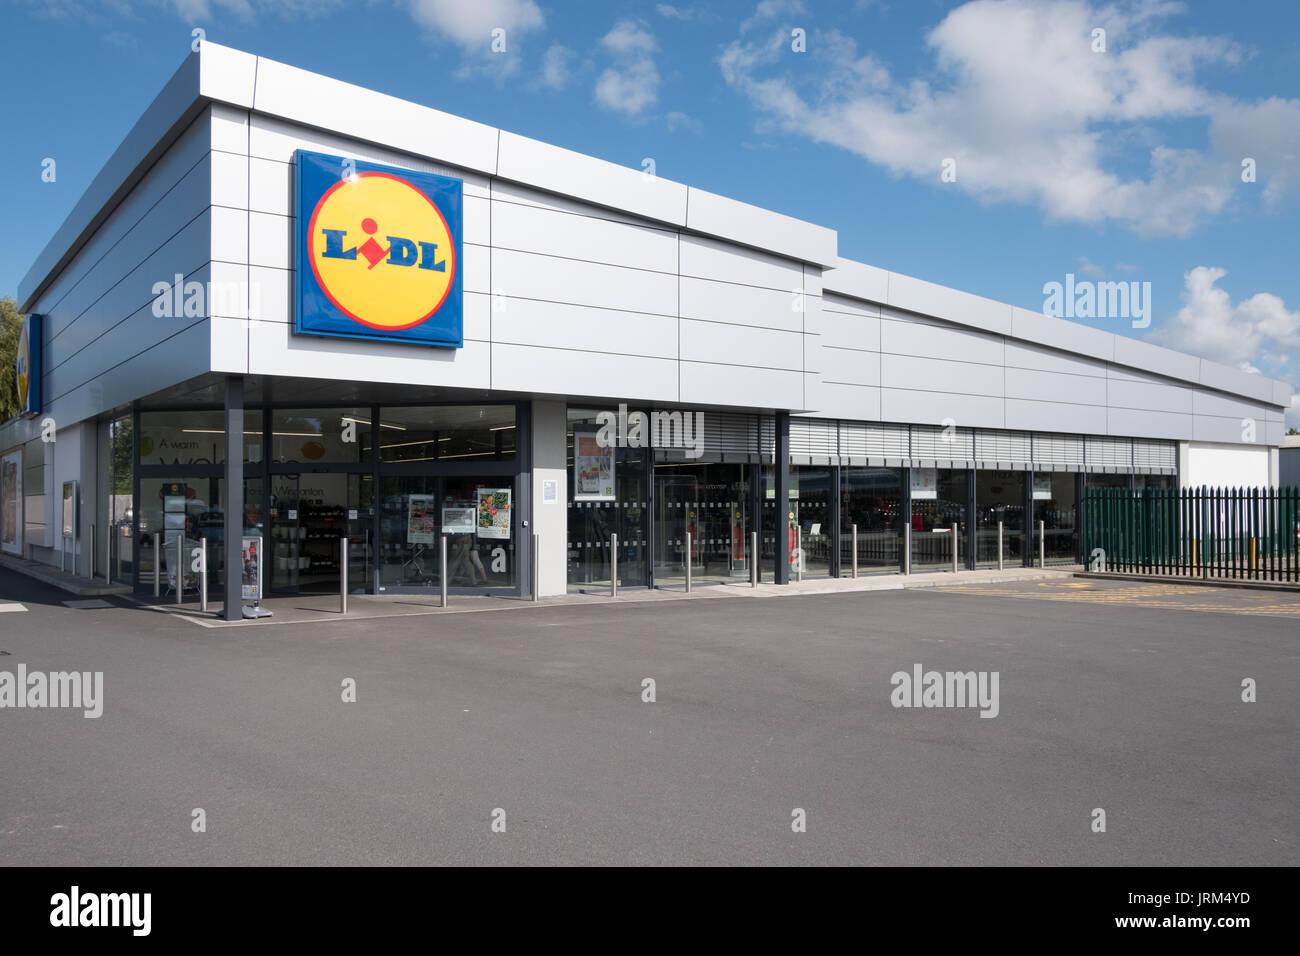 Lidl Stiftung & Co. KG (formerly Schwarz Unternehmenstreuhand KG, is a German global discount sore Wincanton Somerset Shop - Stock Image